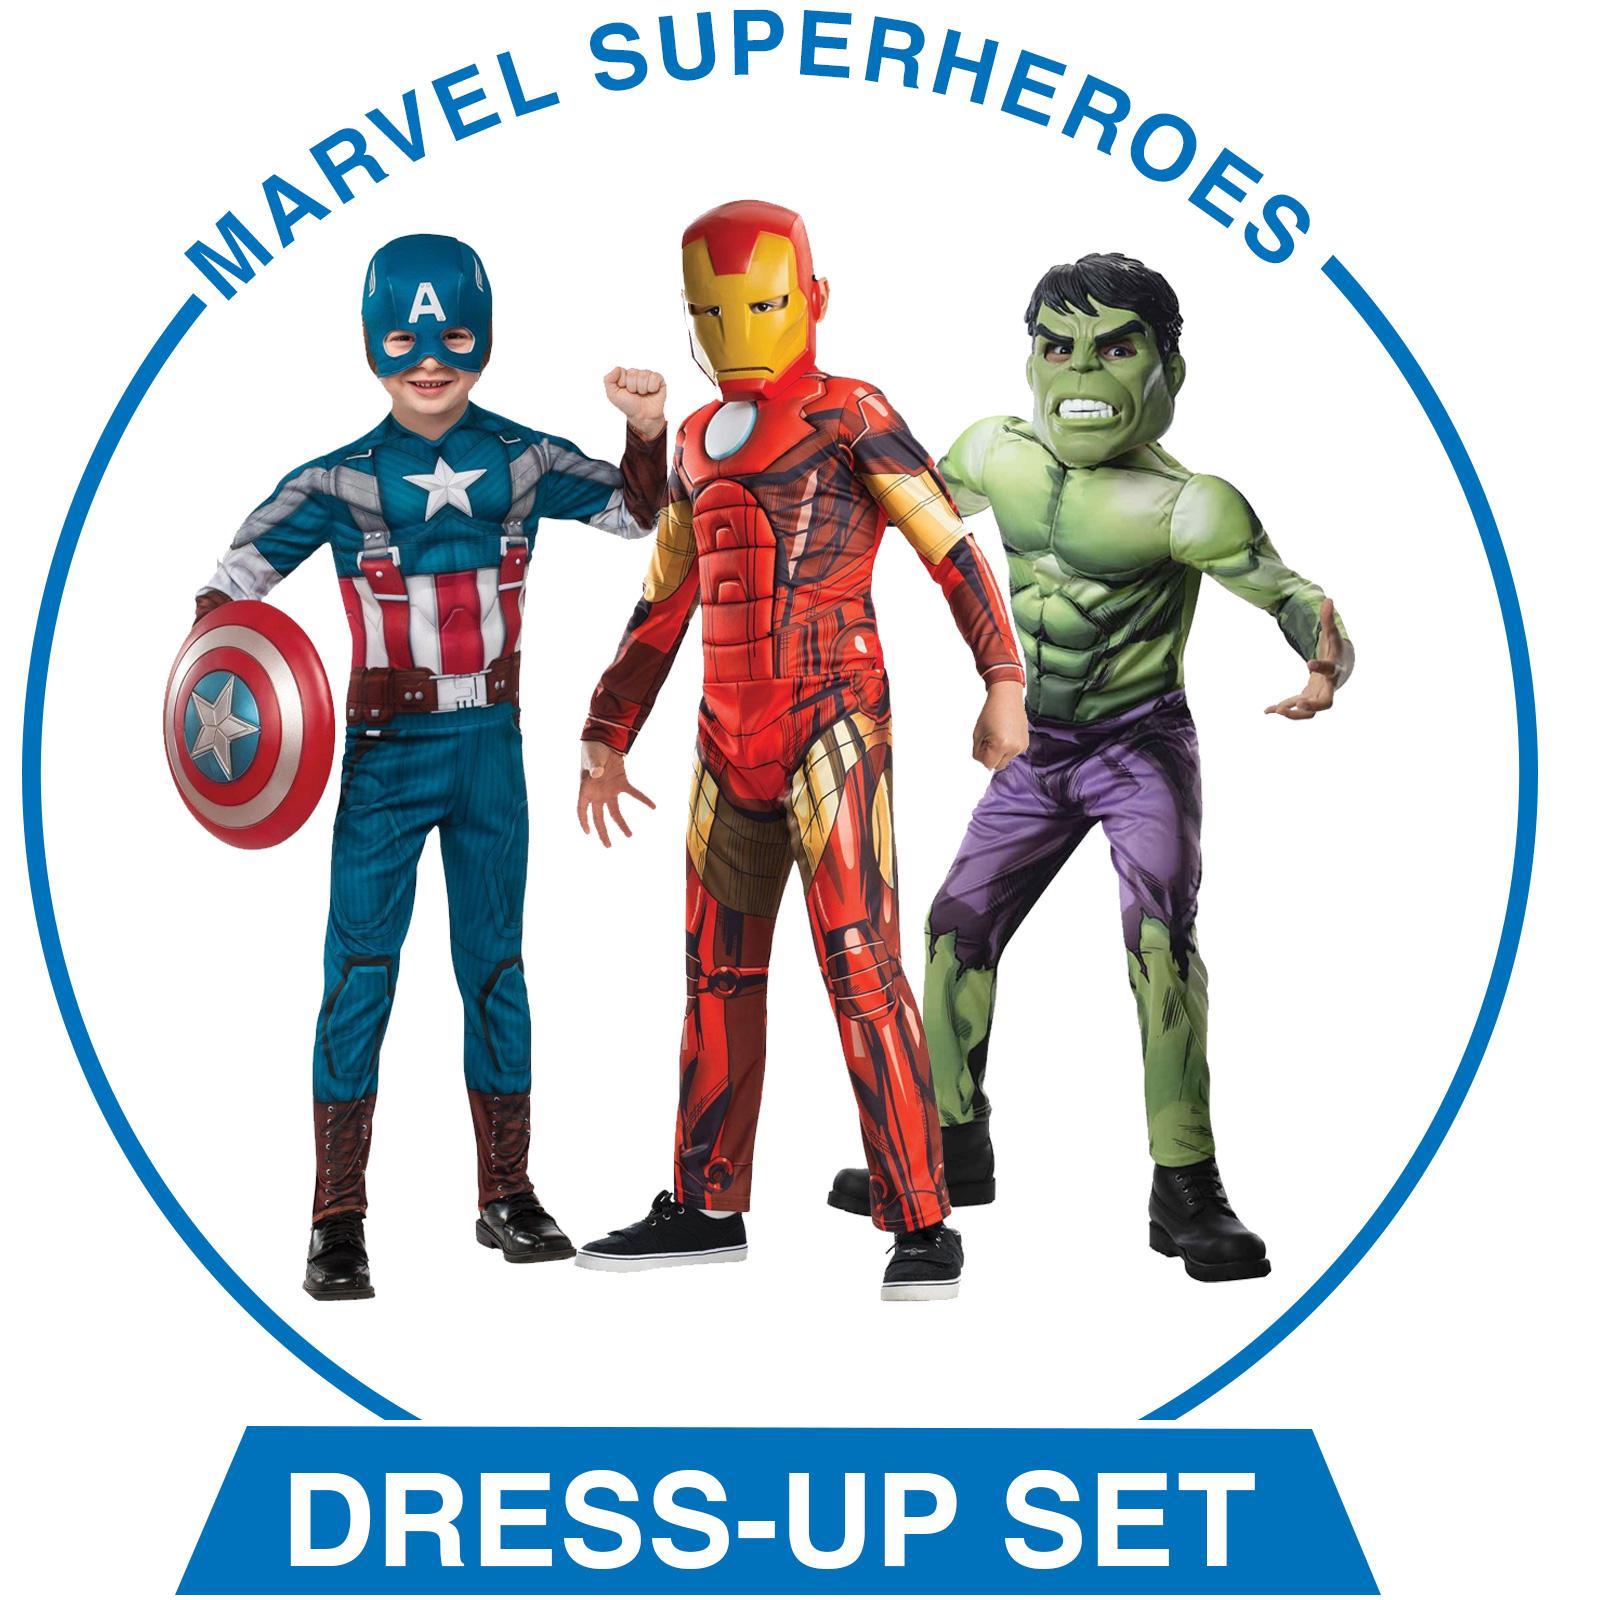 Marvel Superheroes Dress-Up Set - Boys